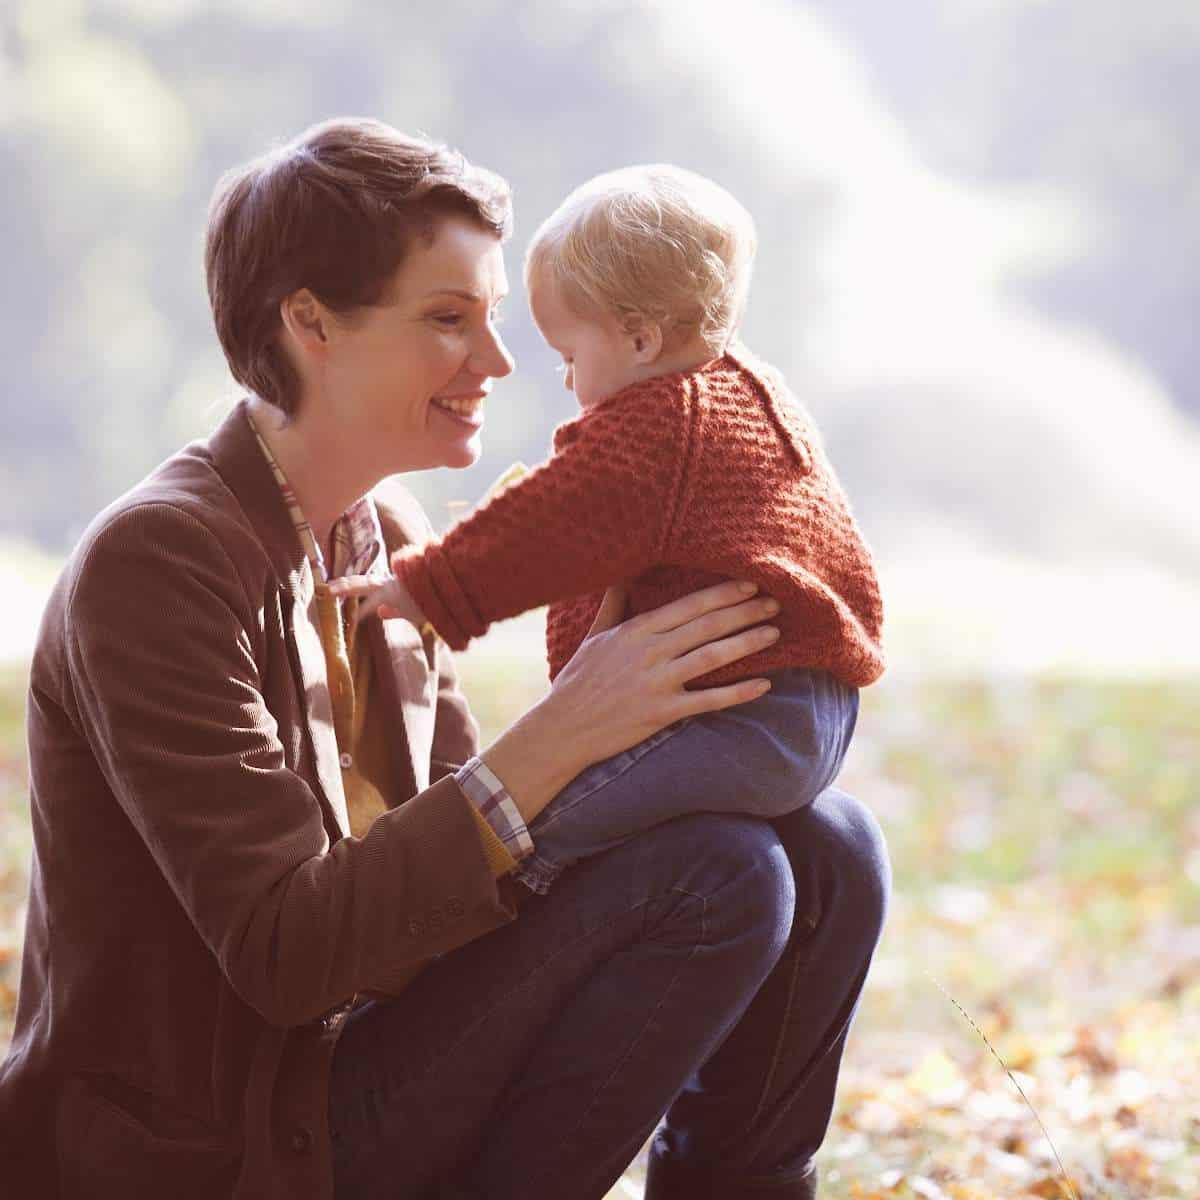 Autumn Baby Names - Fall Baby Names (1)